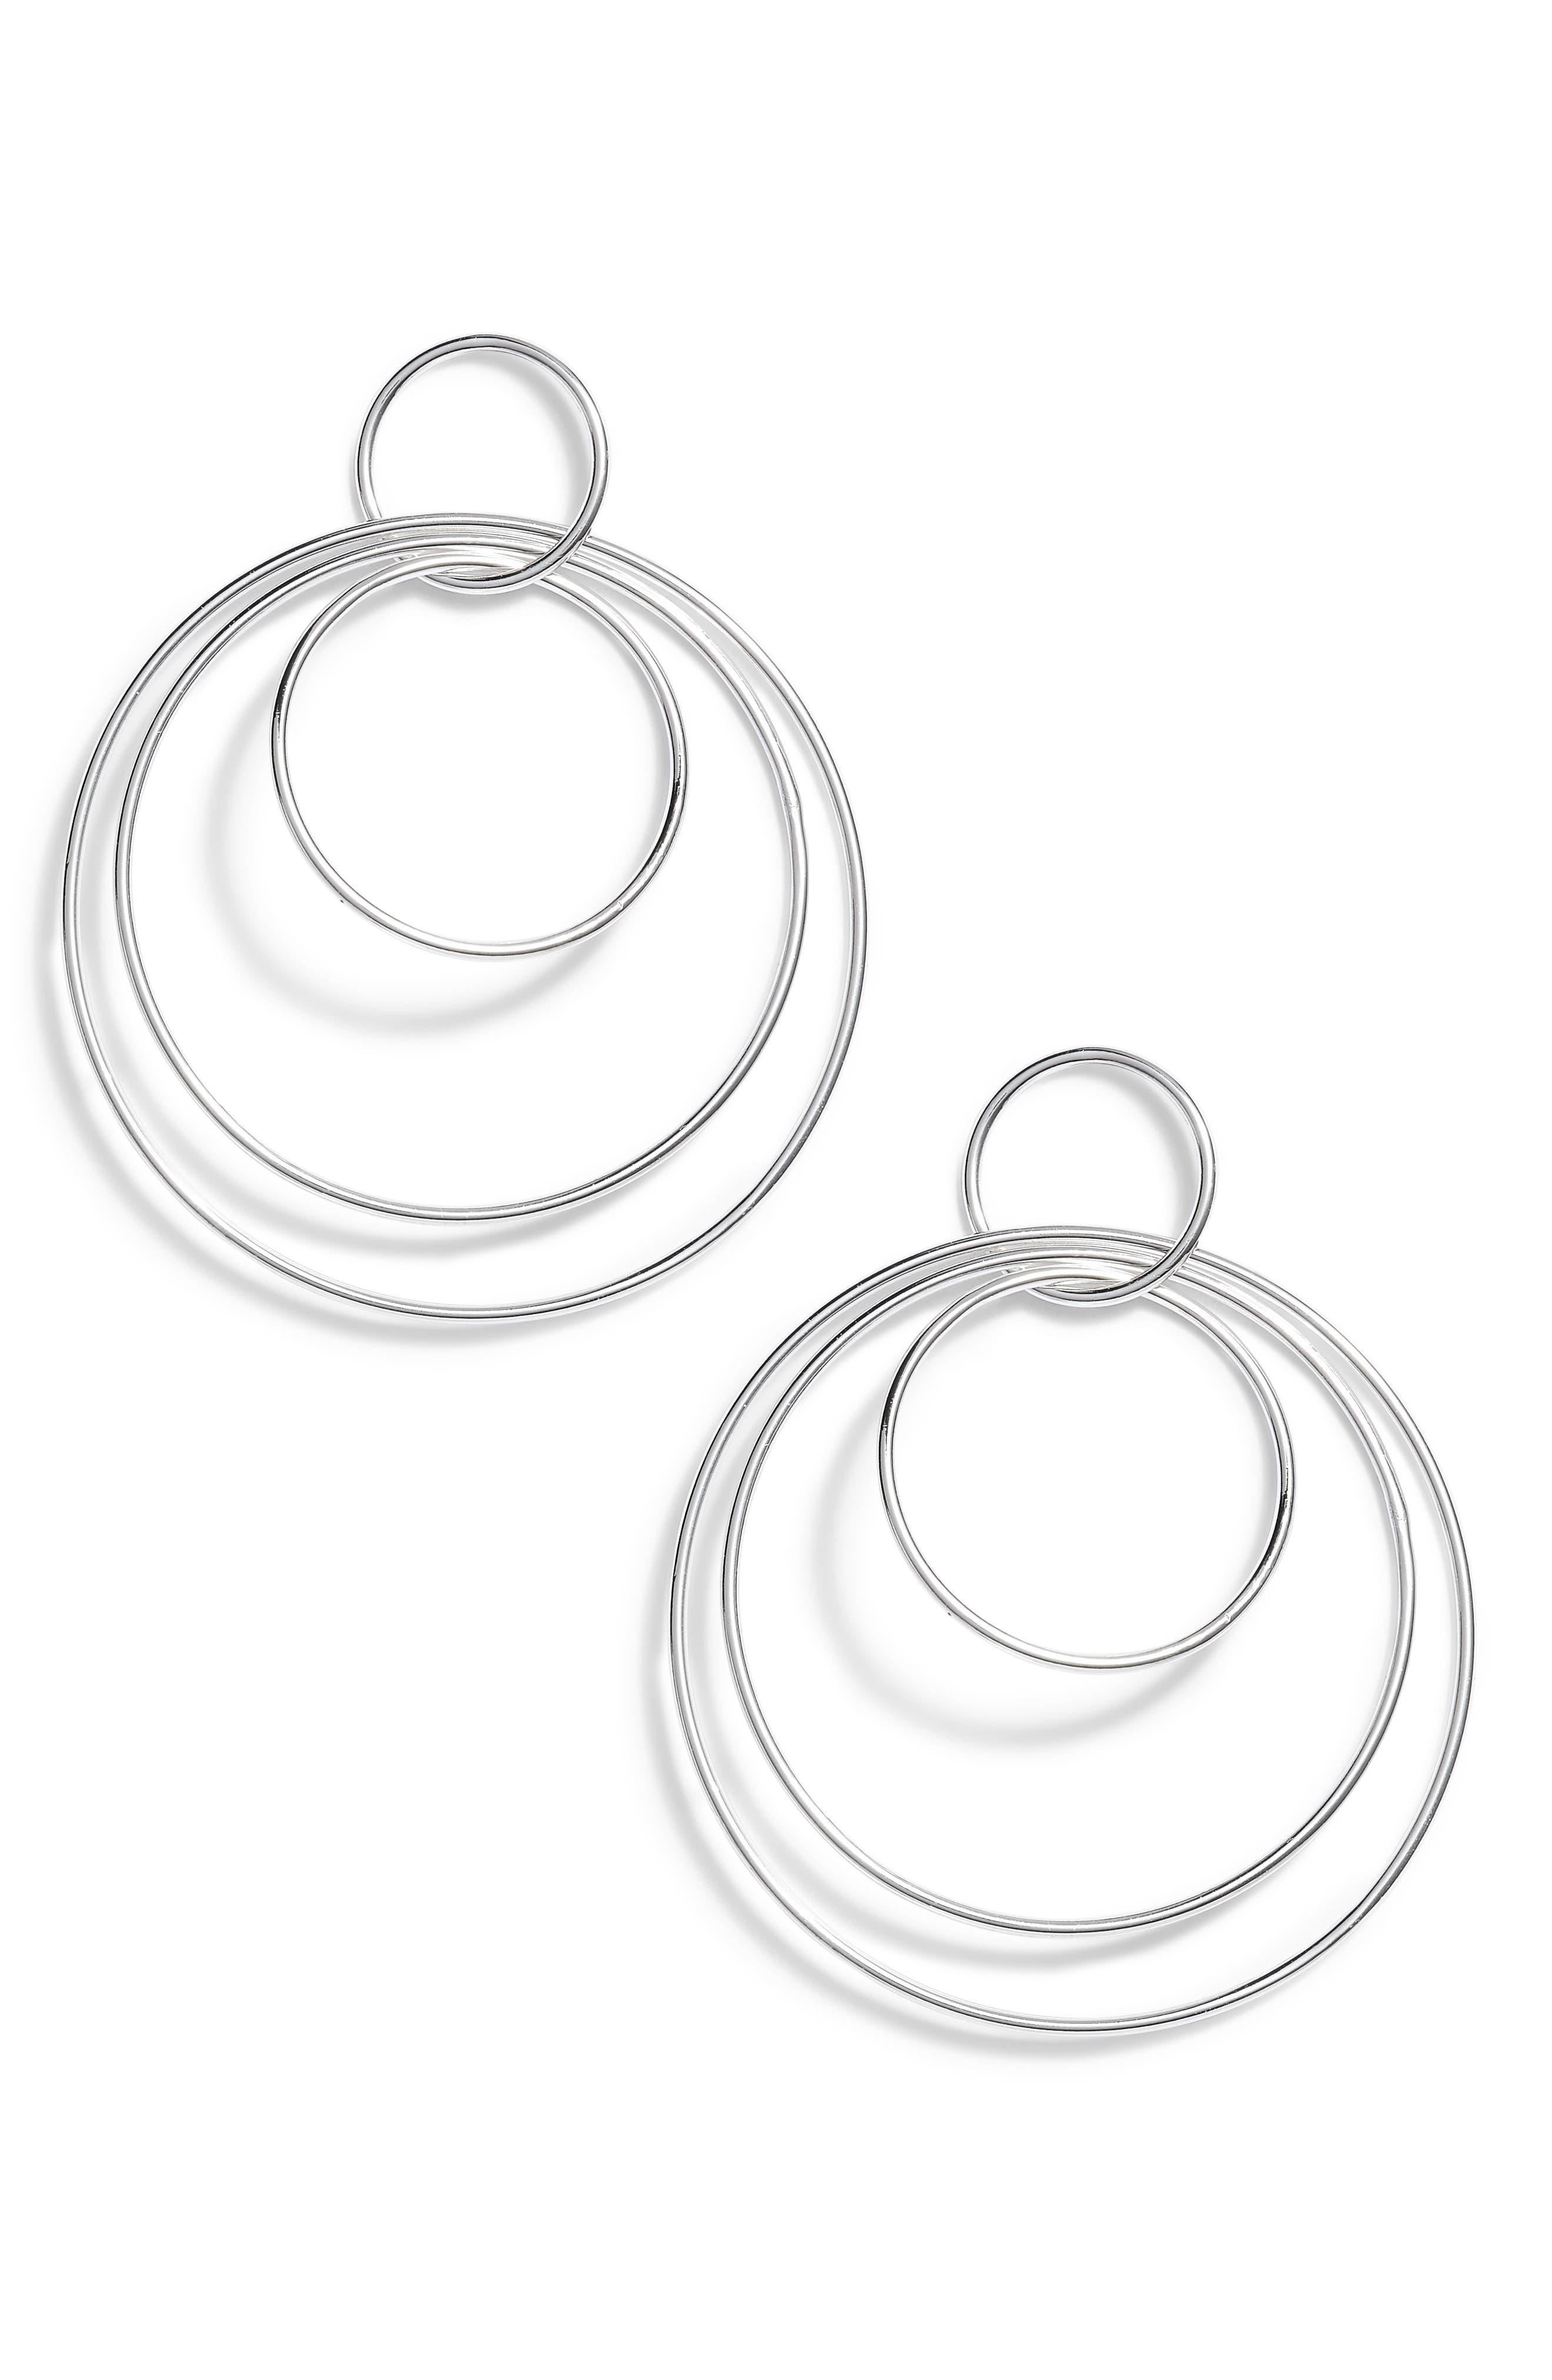 Wilshire Earrings,                         Main,                         color, 040